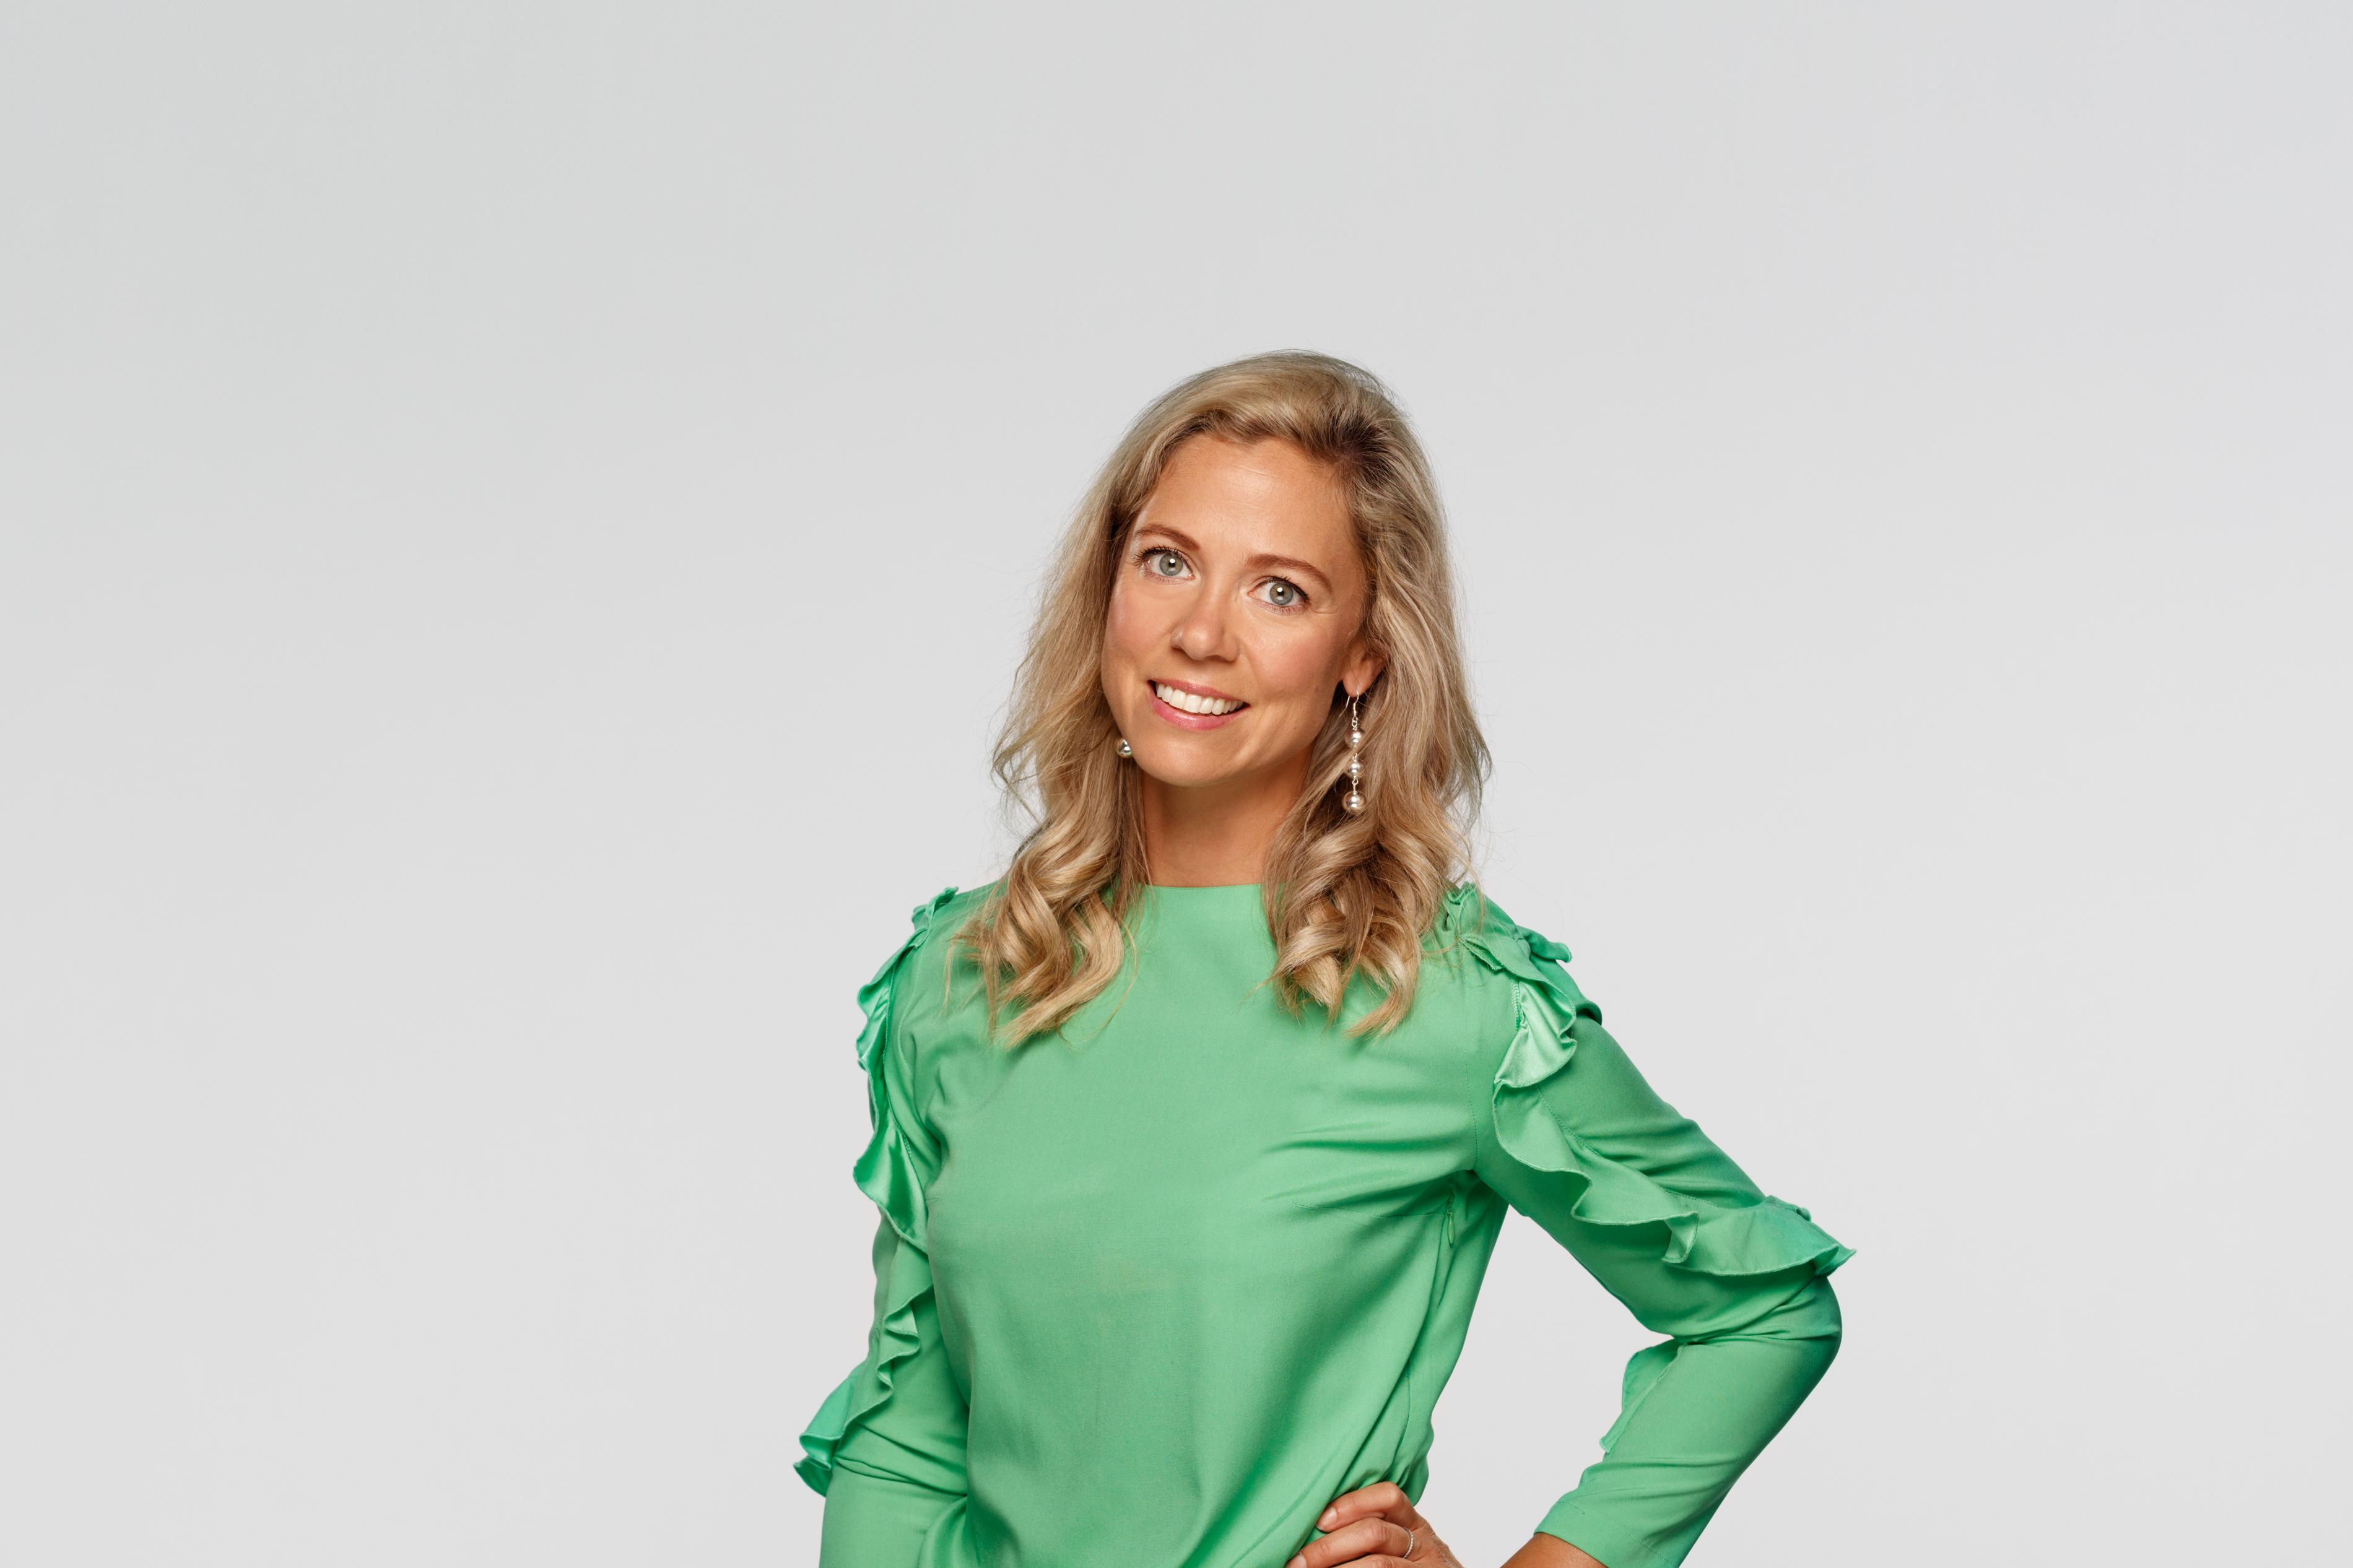 Marlene Vintenius